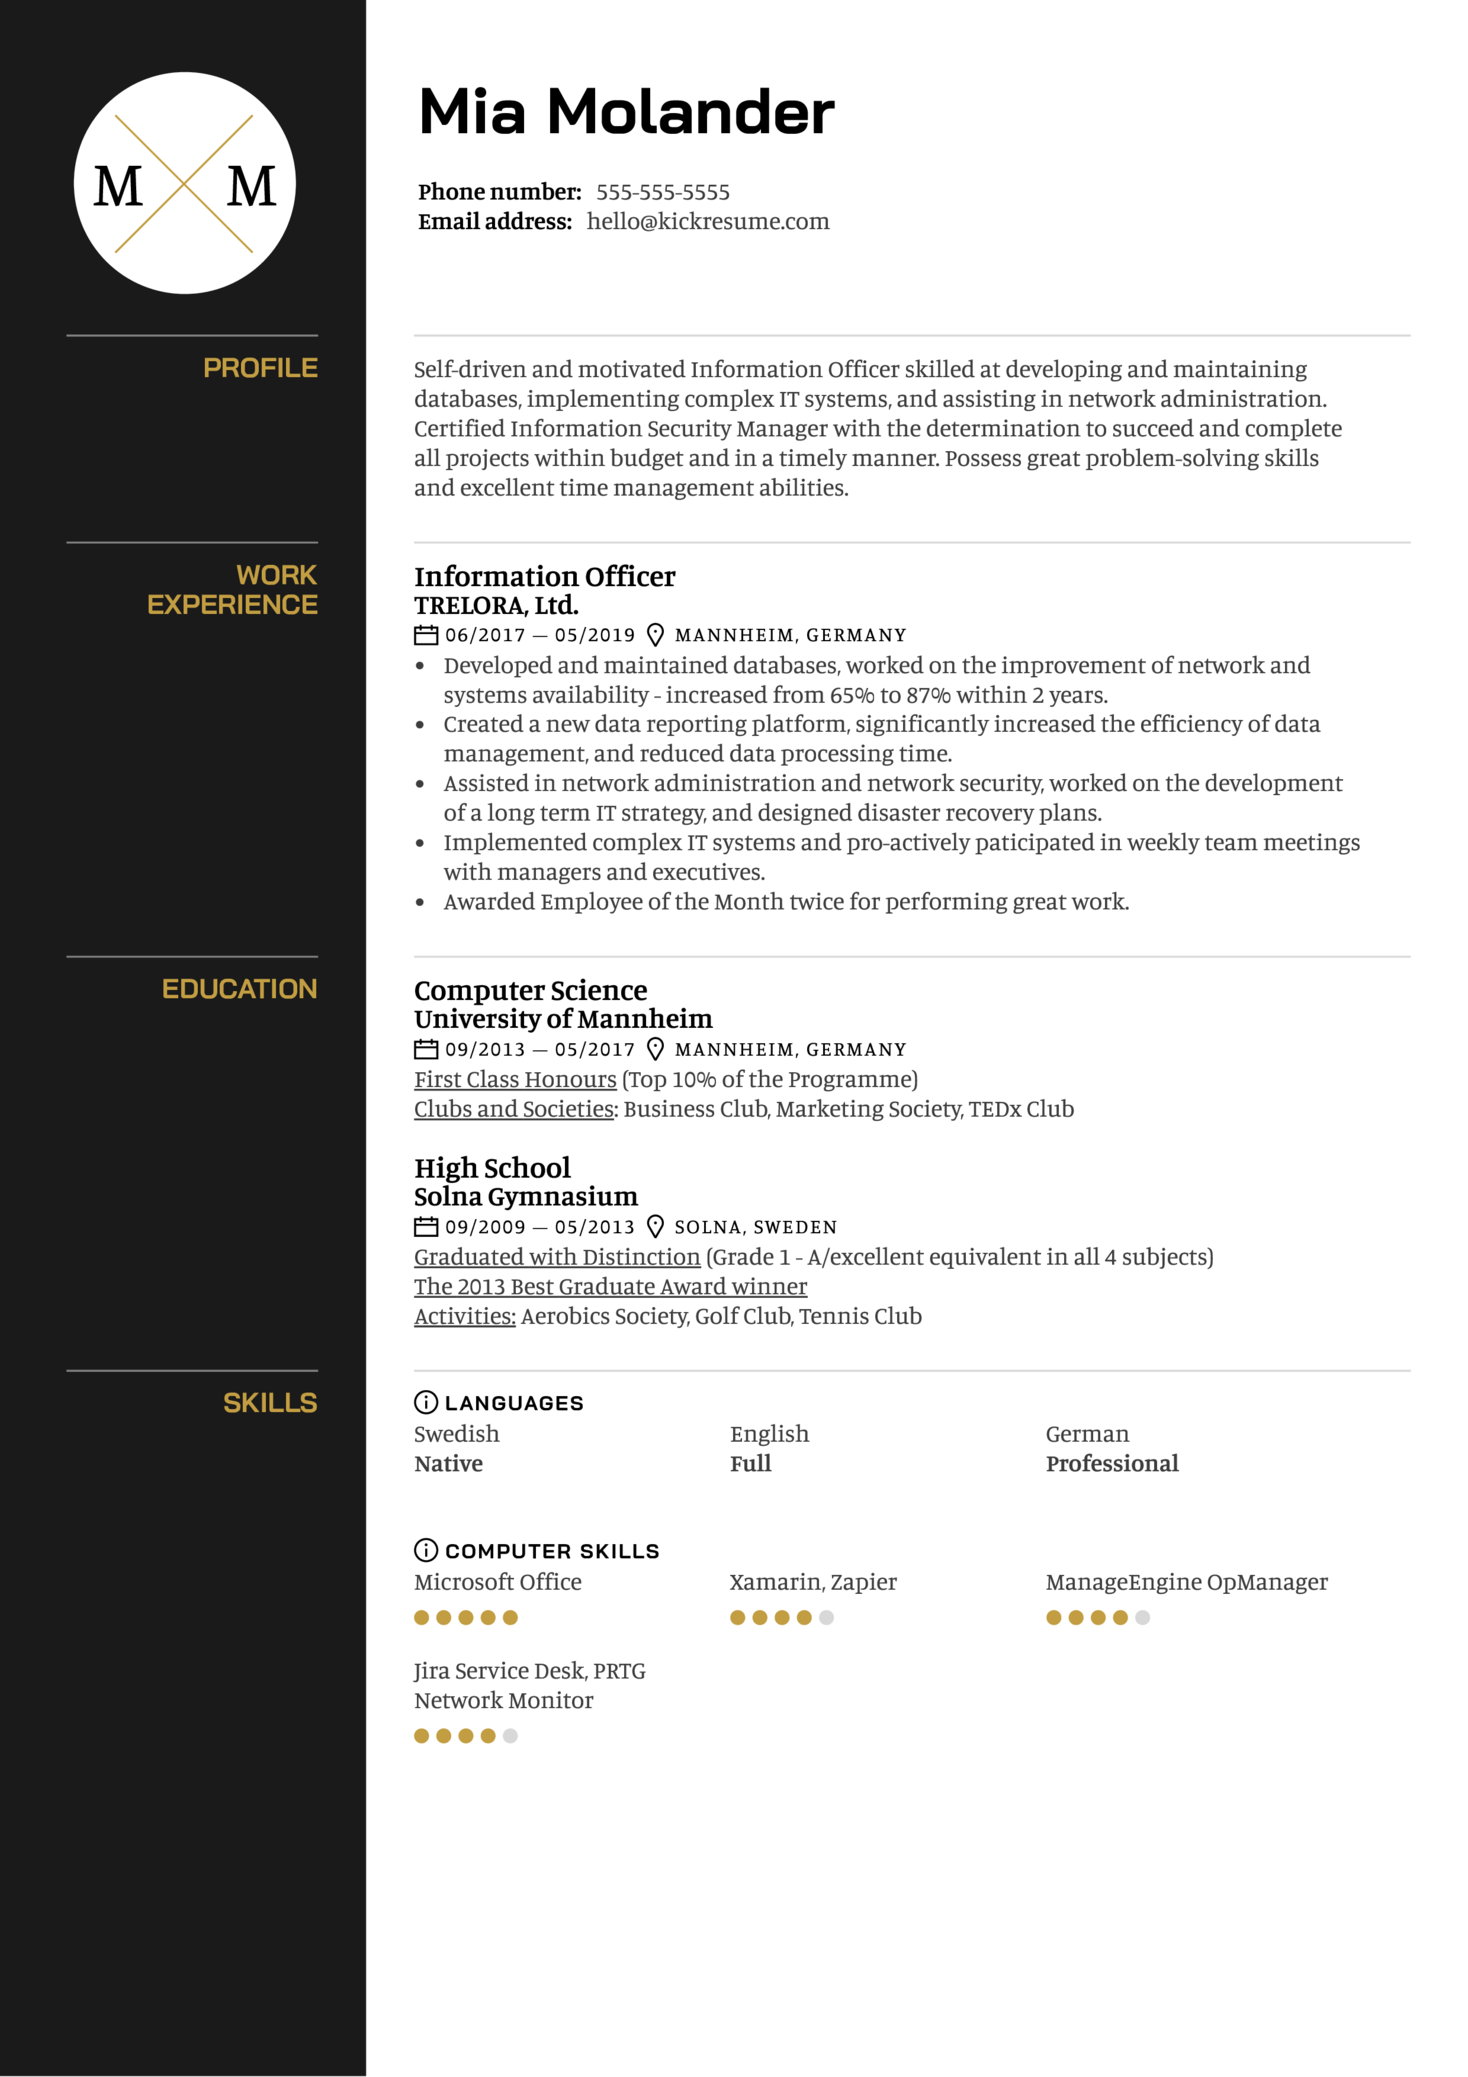 Information Officer Resume Template (Teil 1)